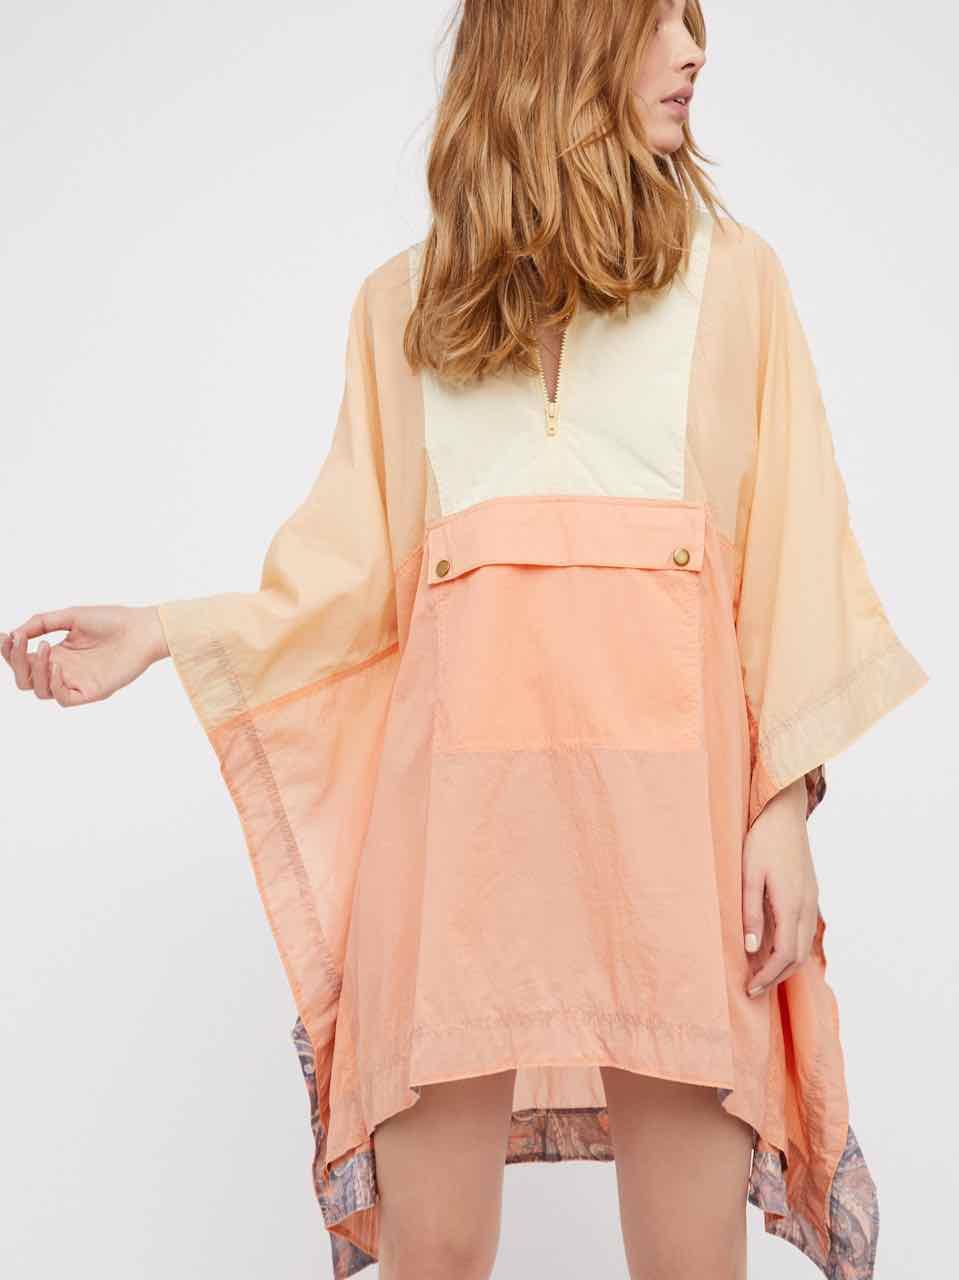 Nylon clothes online